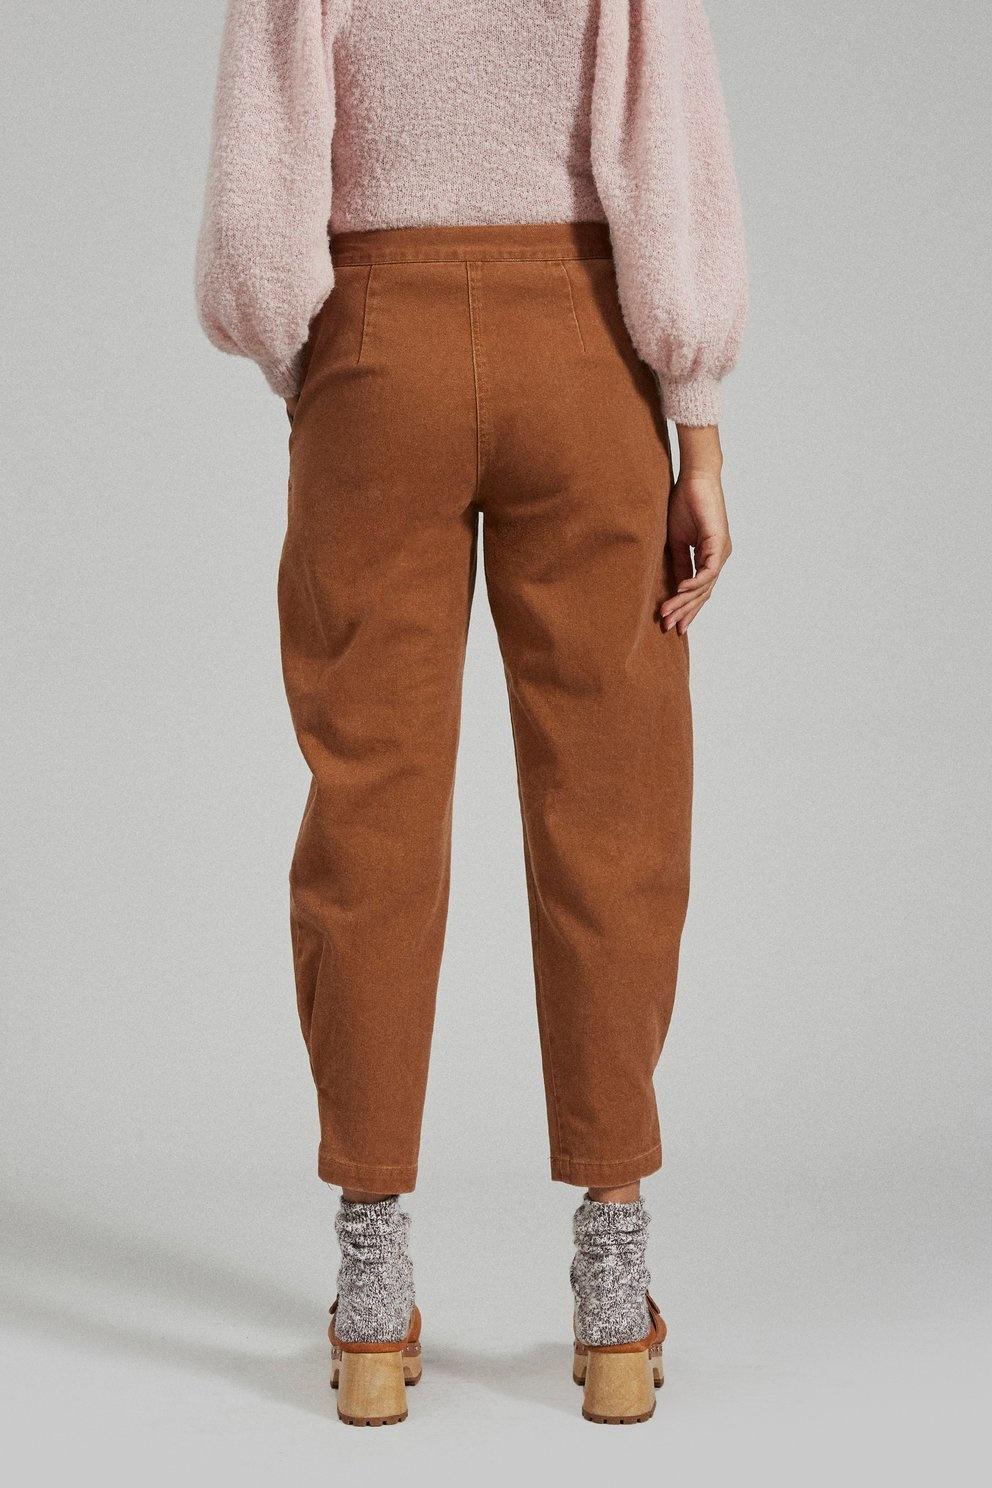 Transit Pant Chestnut